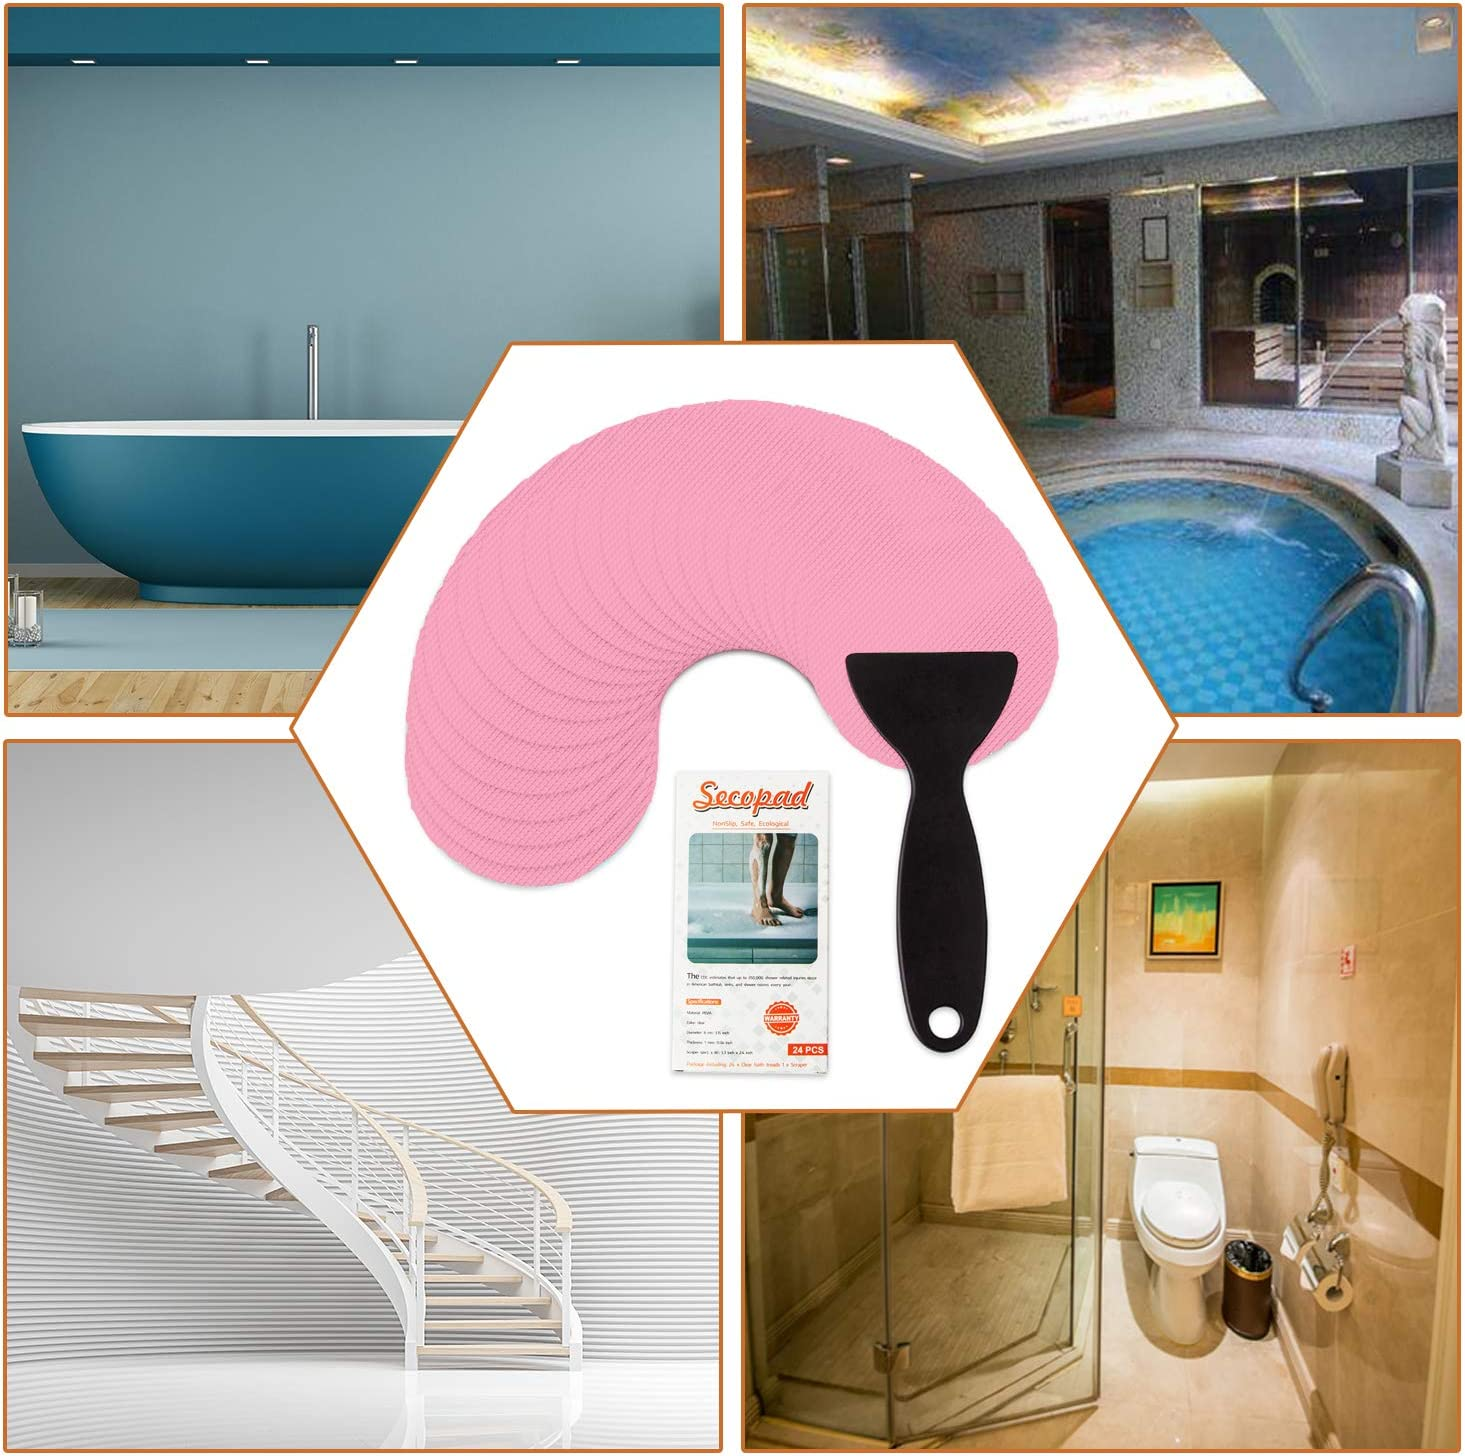 Secopad Non-Slip Bathtub Stickers Safety Bathroom Tubs Showers Treads Adhesive Decals Scraper Pink